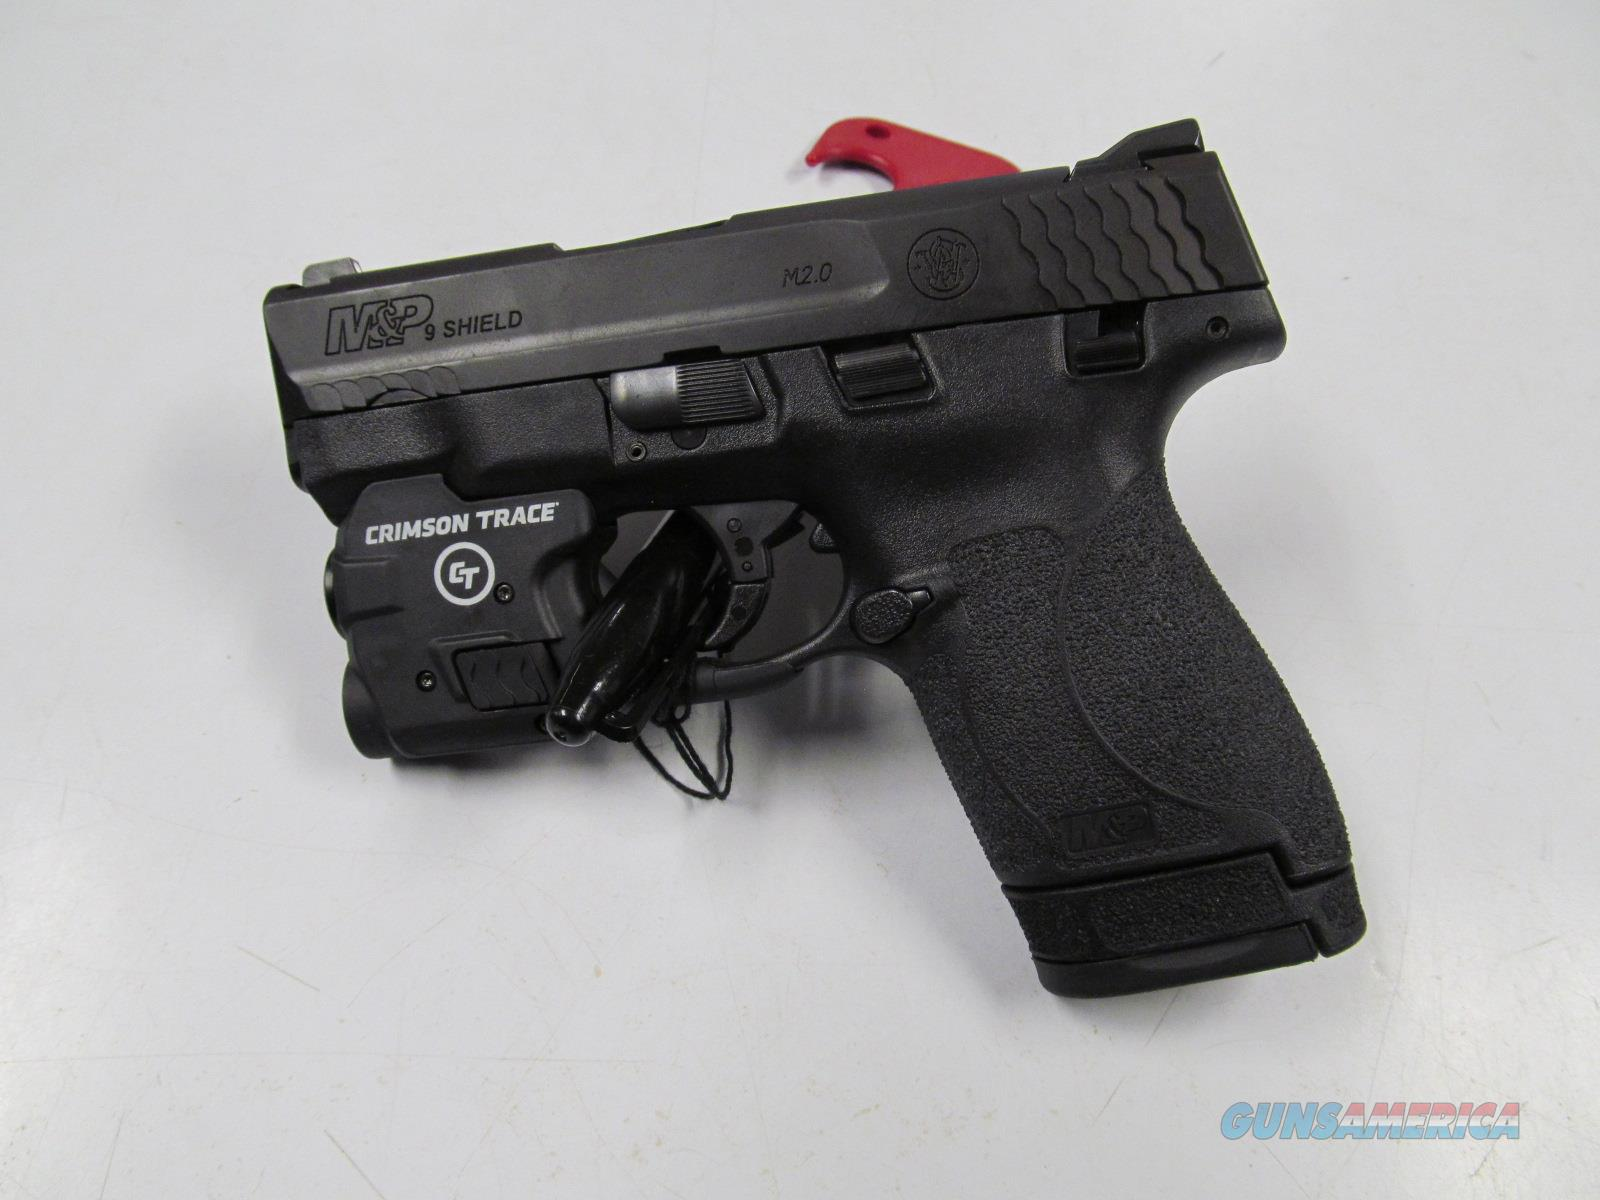 Smith & Wesson M&P9 Shield M2.0  Guns > Pistols > Smith & Wesson Pistols - Autos > Shield